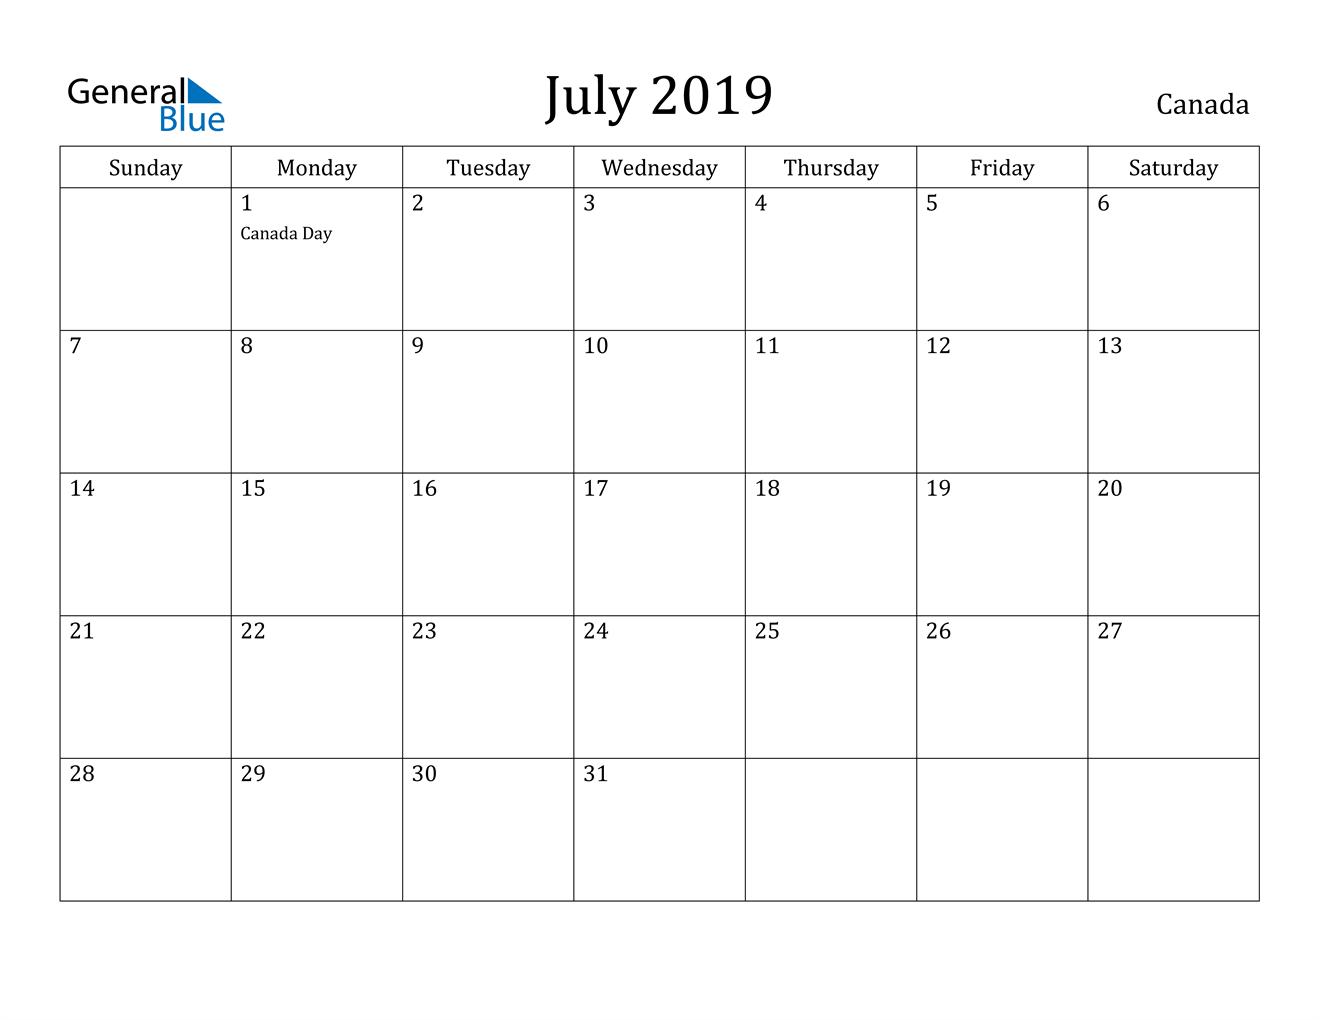 Image of July 2019 Canada Calendar with Holidays Calendar